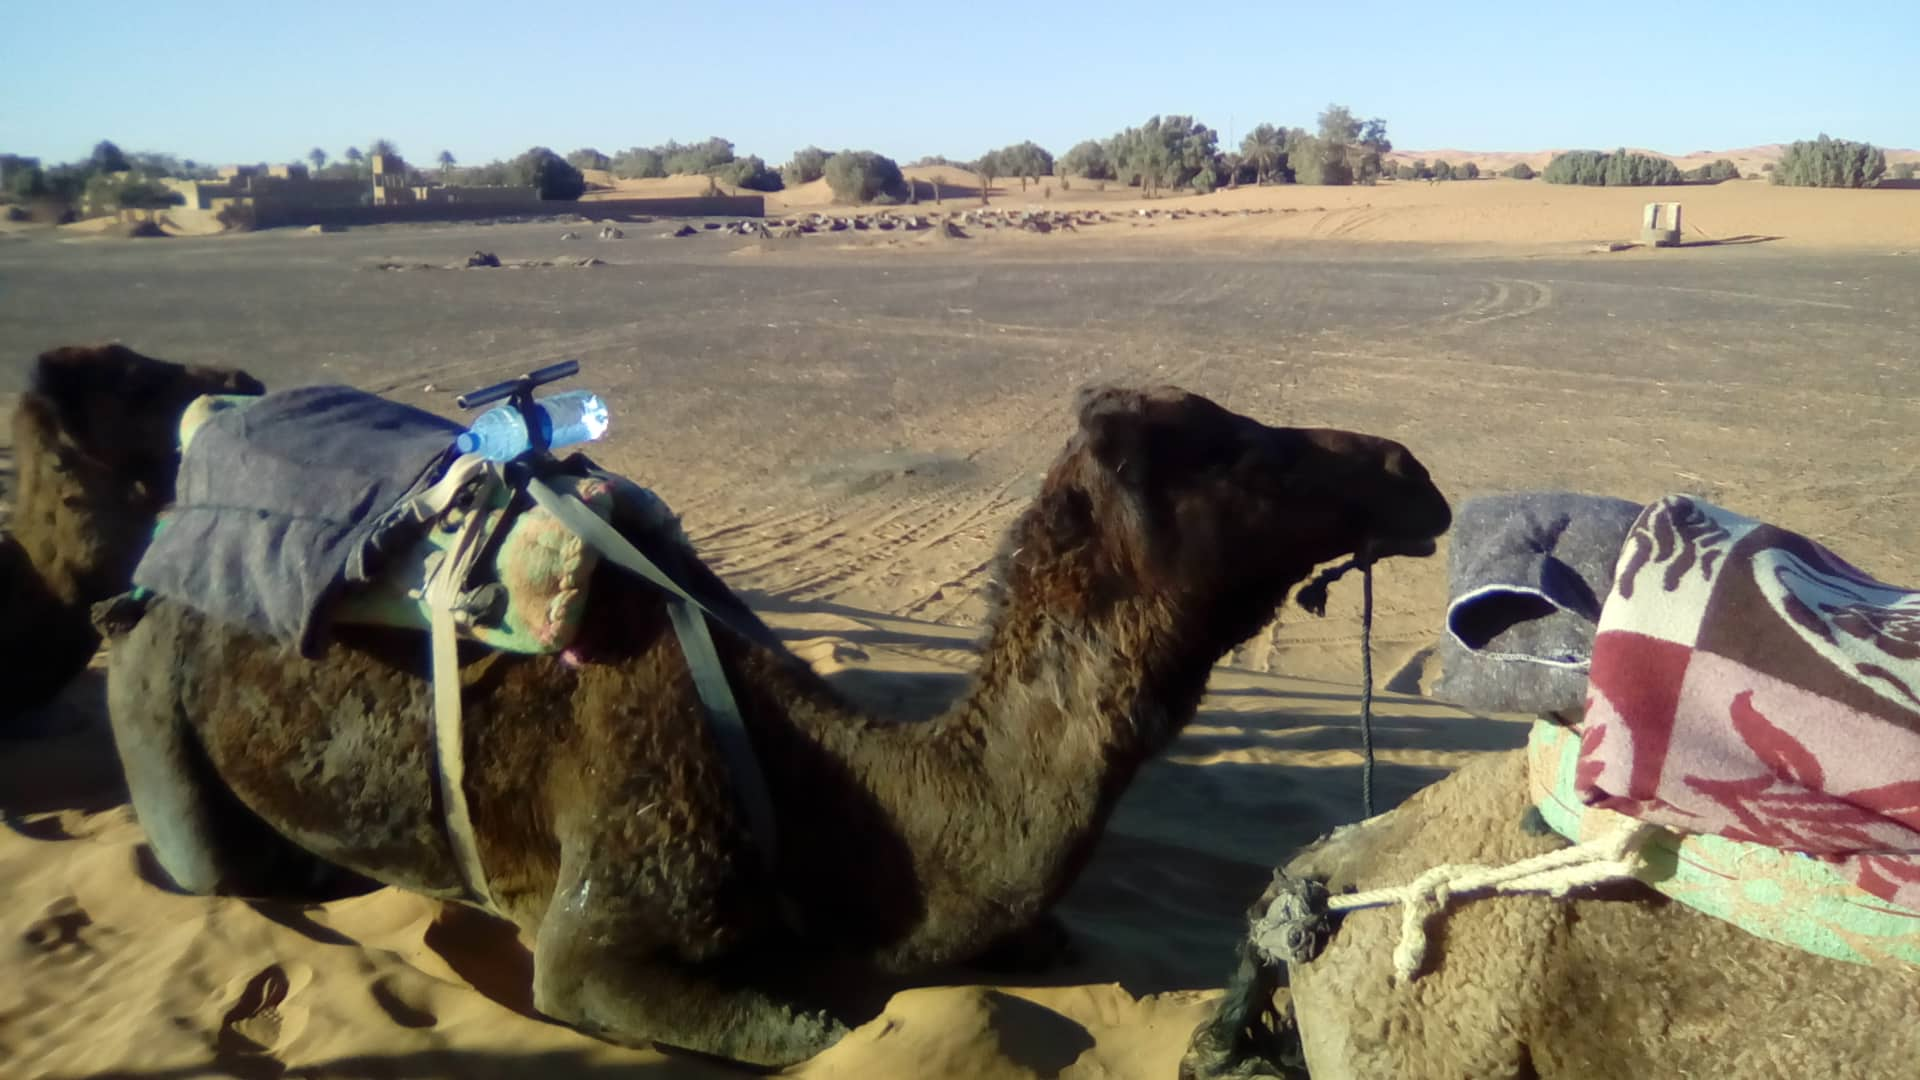 My roommate in the Sahara Desert. Photo Credit: G. Szabo, Fall 2018